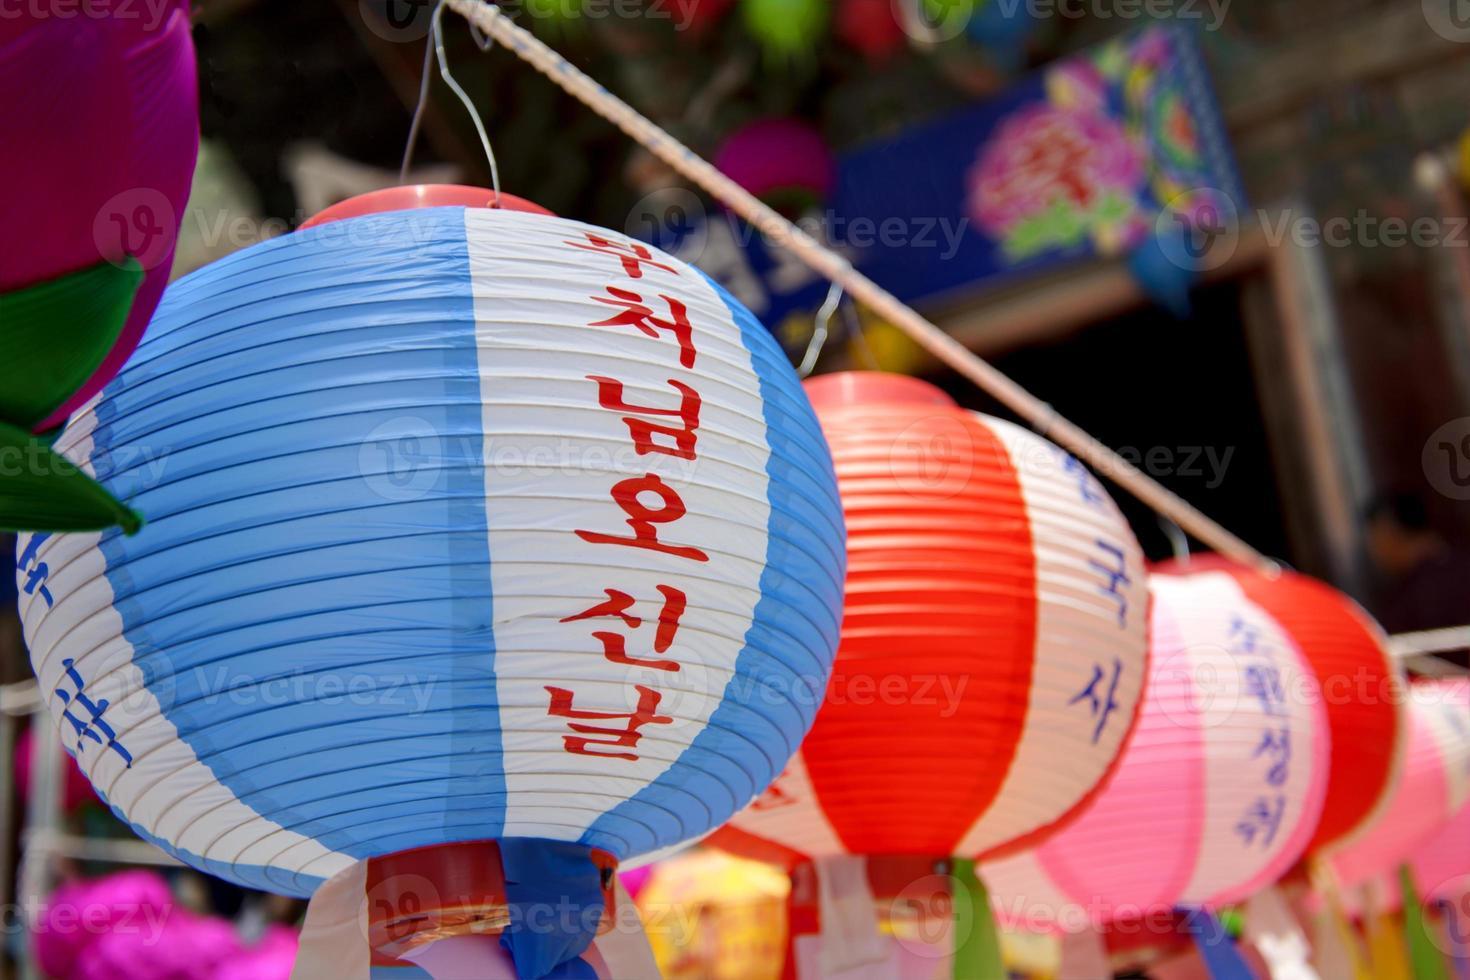 Hanging lanterns for celebrating Buddhas birthday in South Korea. photo